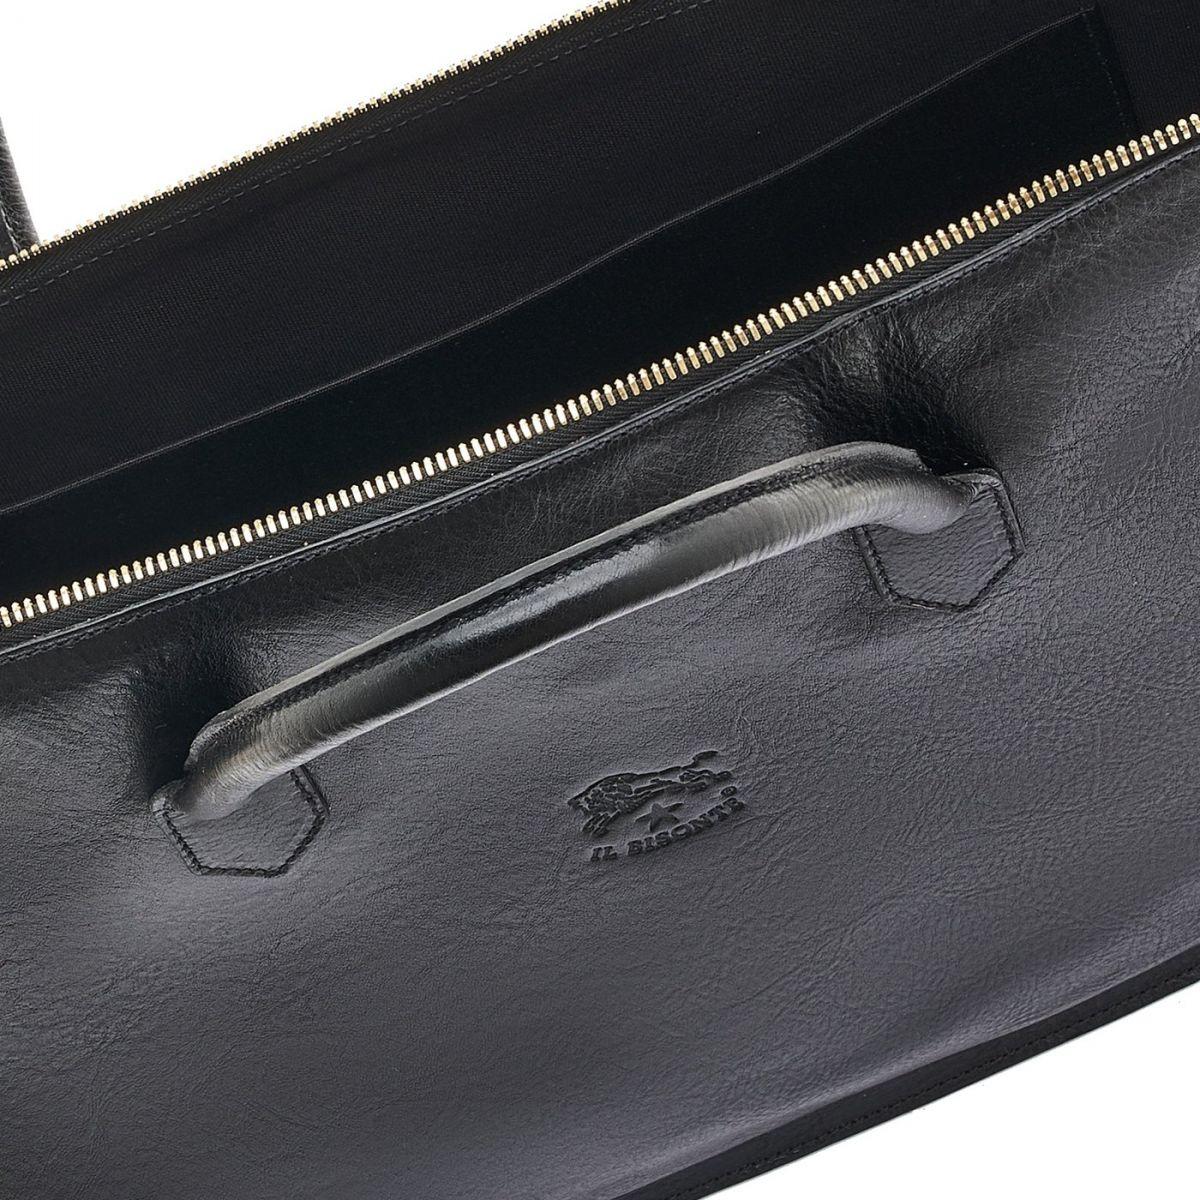 Briefcase in Cowhide Double Leather color Black - Michelangelo line BBC035 | Details